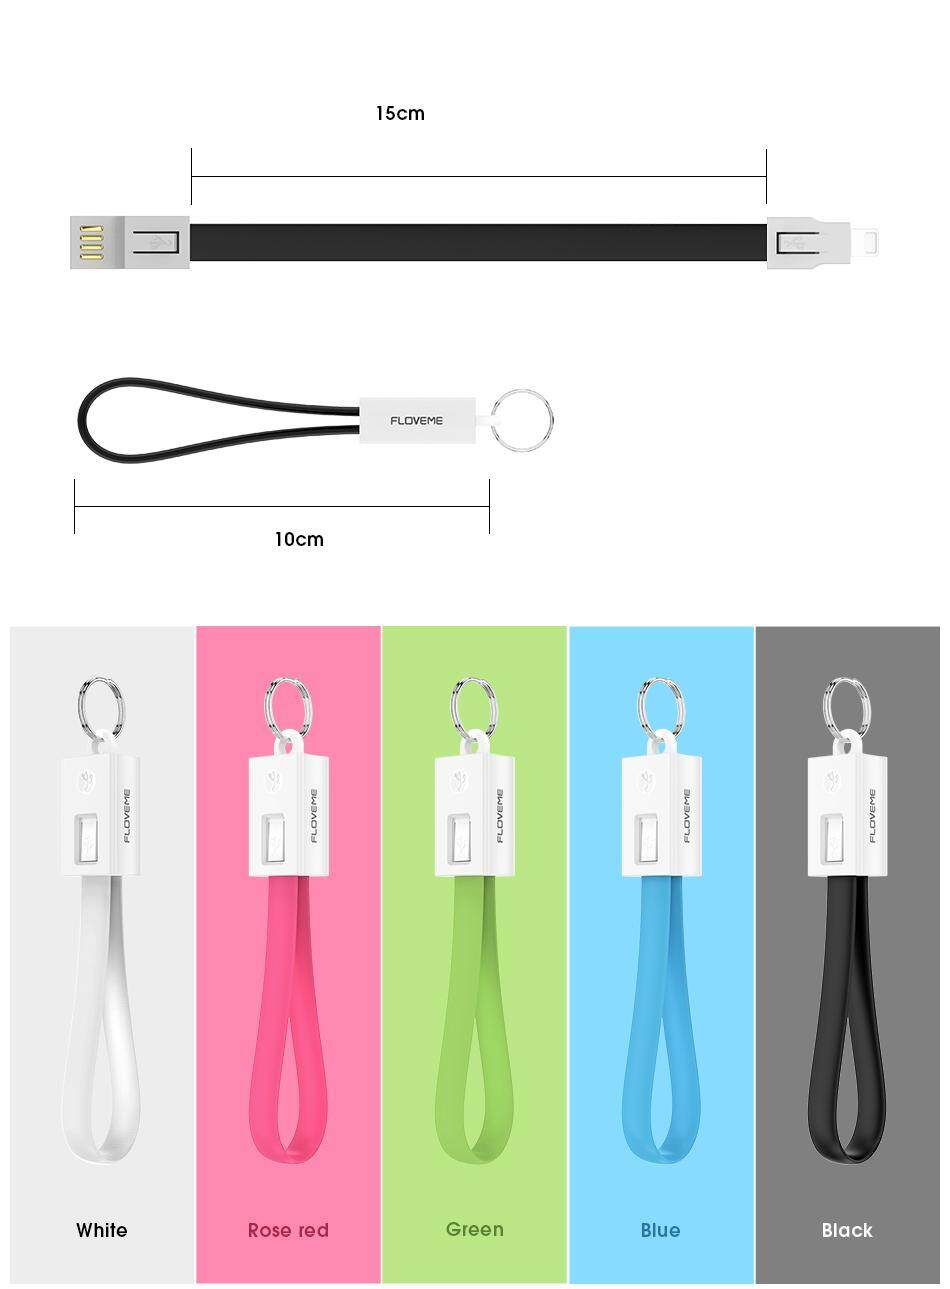 Reflove USB Asli Kabel untuk iPhone 6 7 8 Plus X XR X Charger Gantungan Kunci Magnet Kabel USB